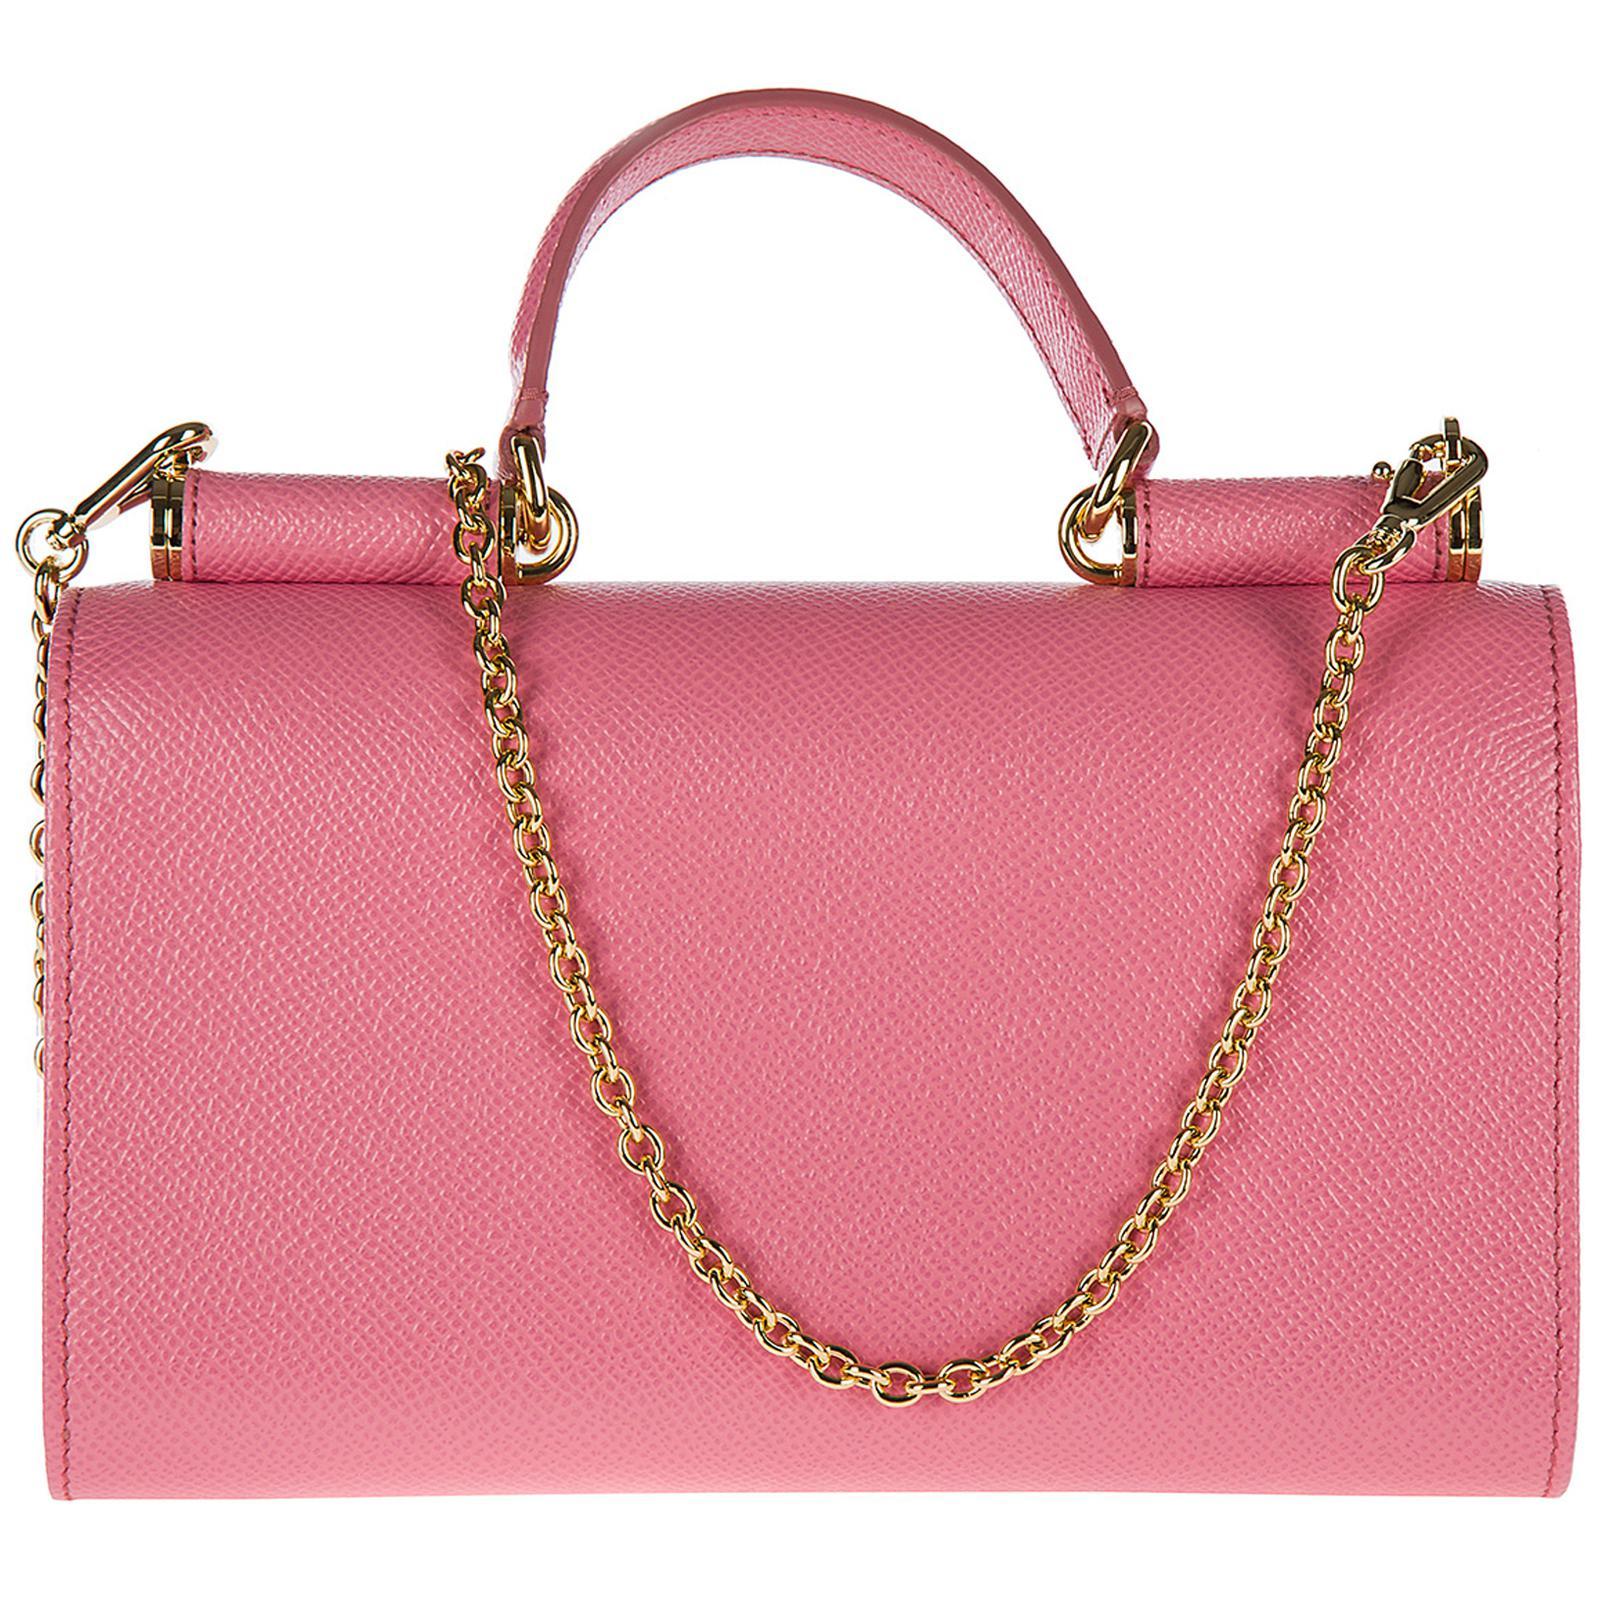 ... Mini Von Bag In Printed Dauphine Leather  size 40 5fcc0 daec0 Lyst - Dolce  Gabbana Leather Clutch With Shoulder Strap Han 5b0dc2cda2830